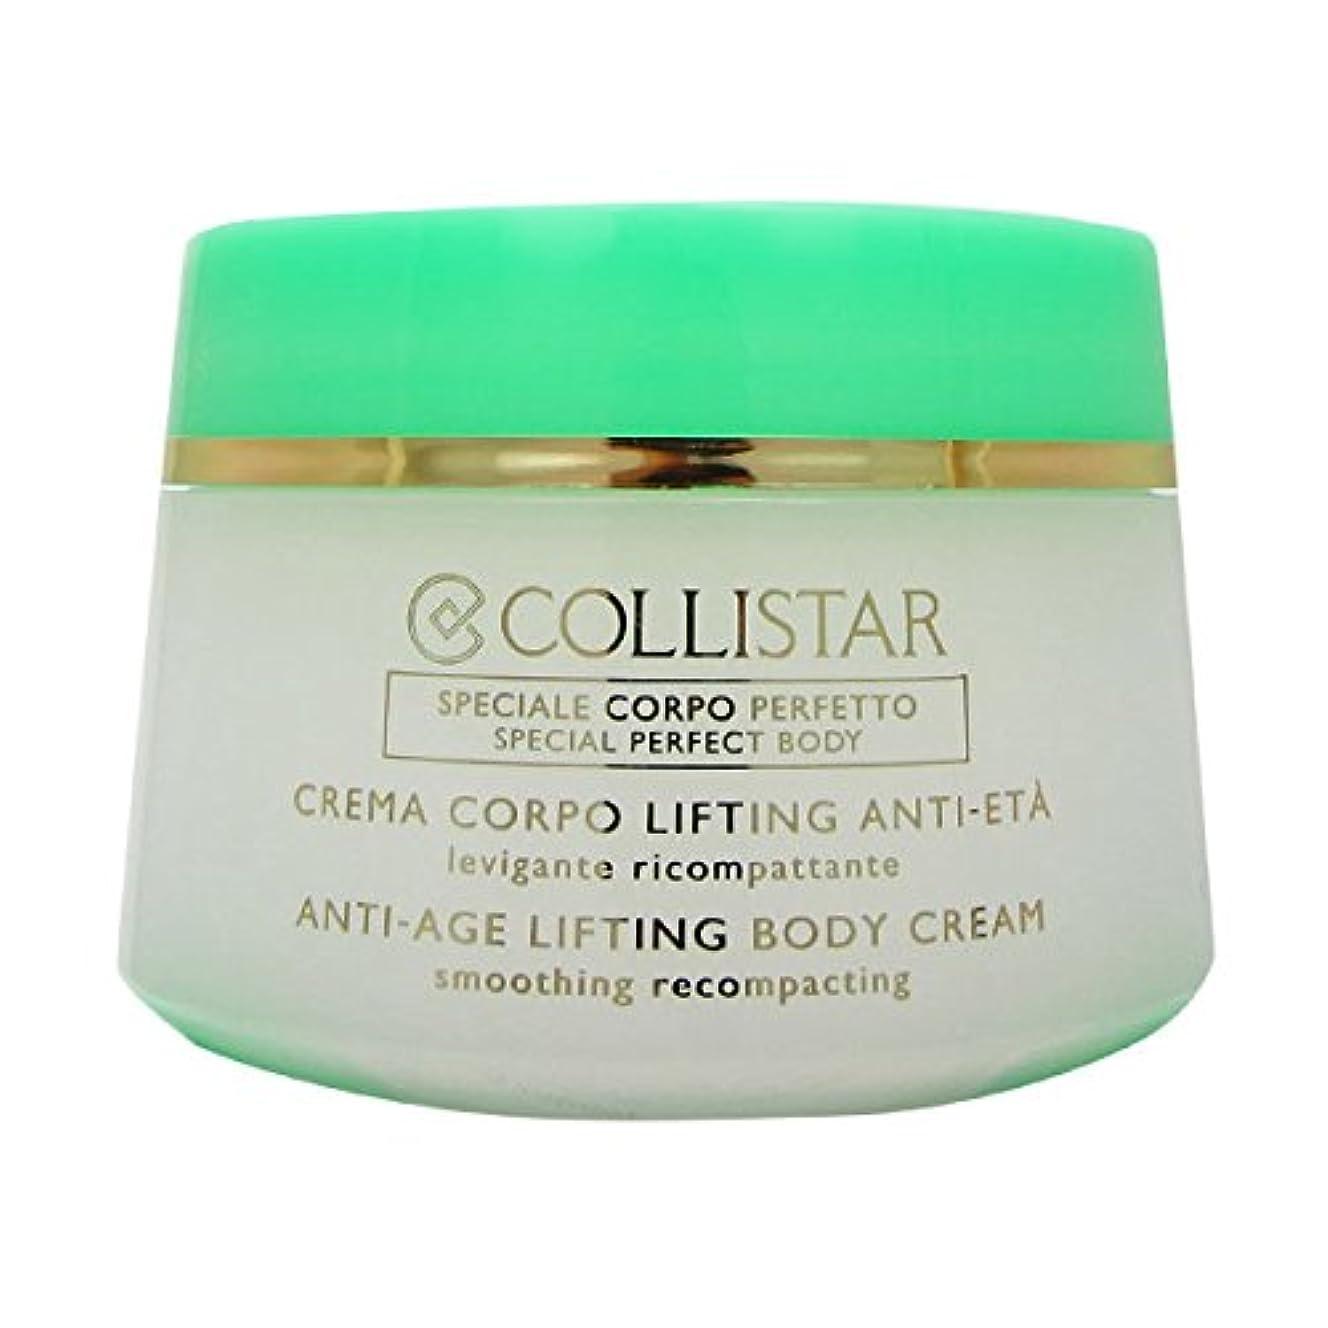 レバー溝管理者Collistar Anti-age Lifting Body Cream 400ml [並行輸入品]